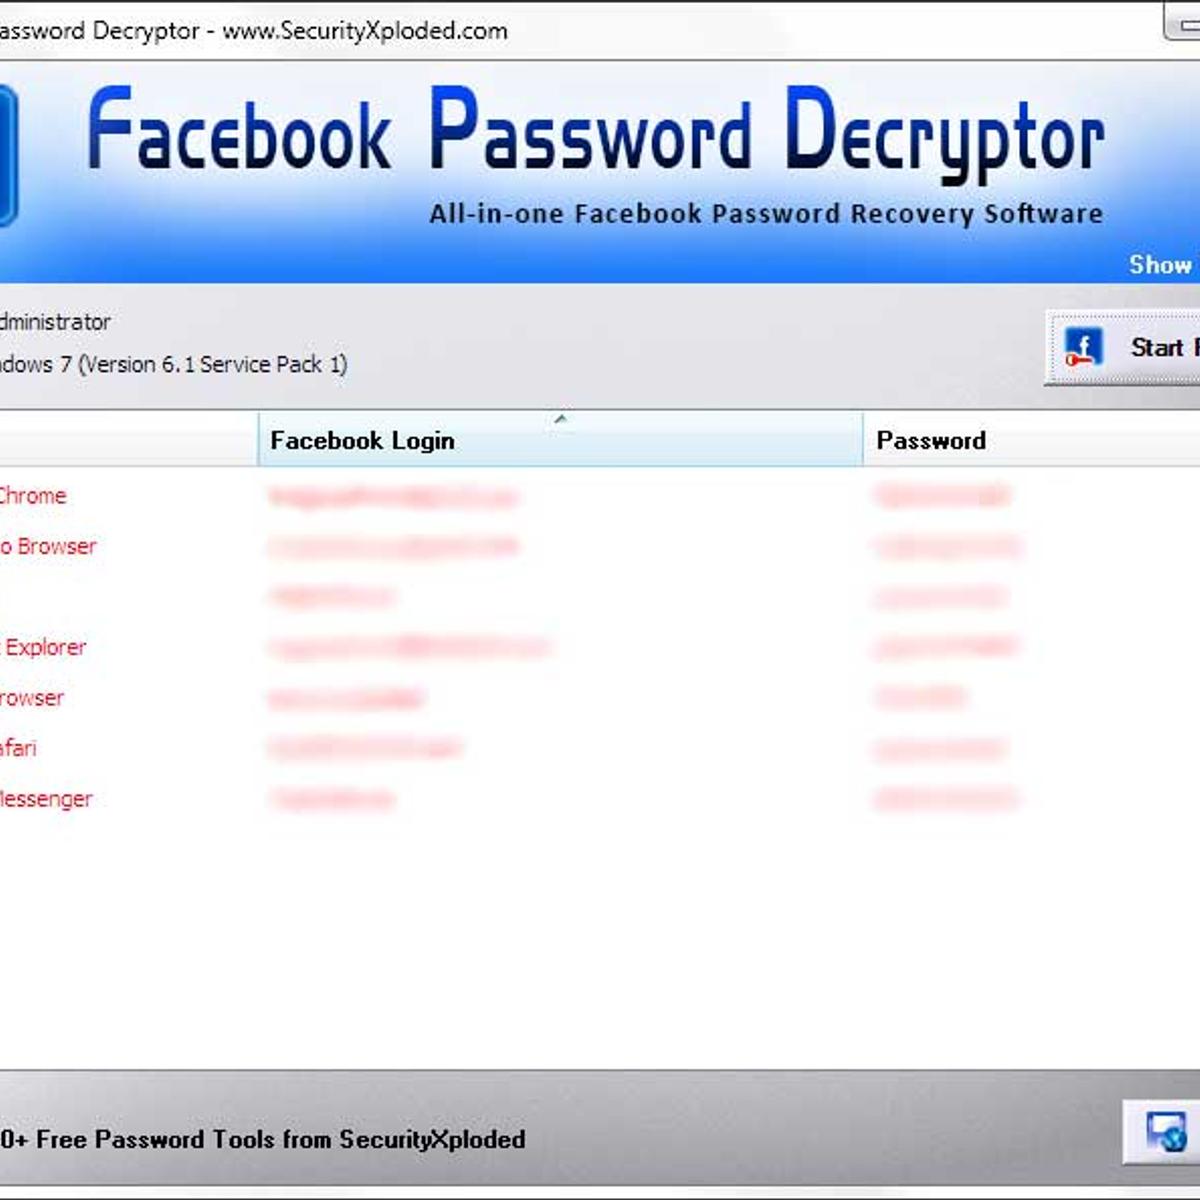 Facebook Password Decryptor Alternatives and Similar